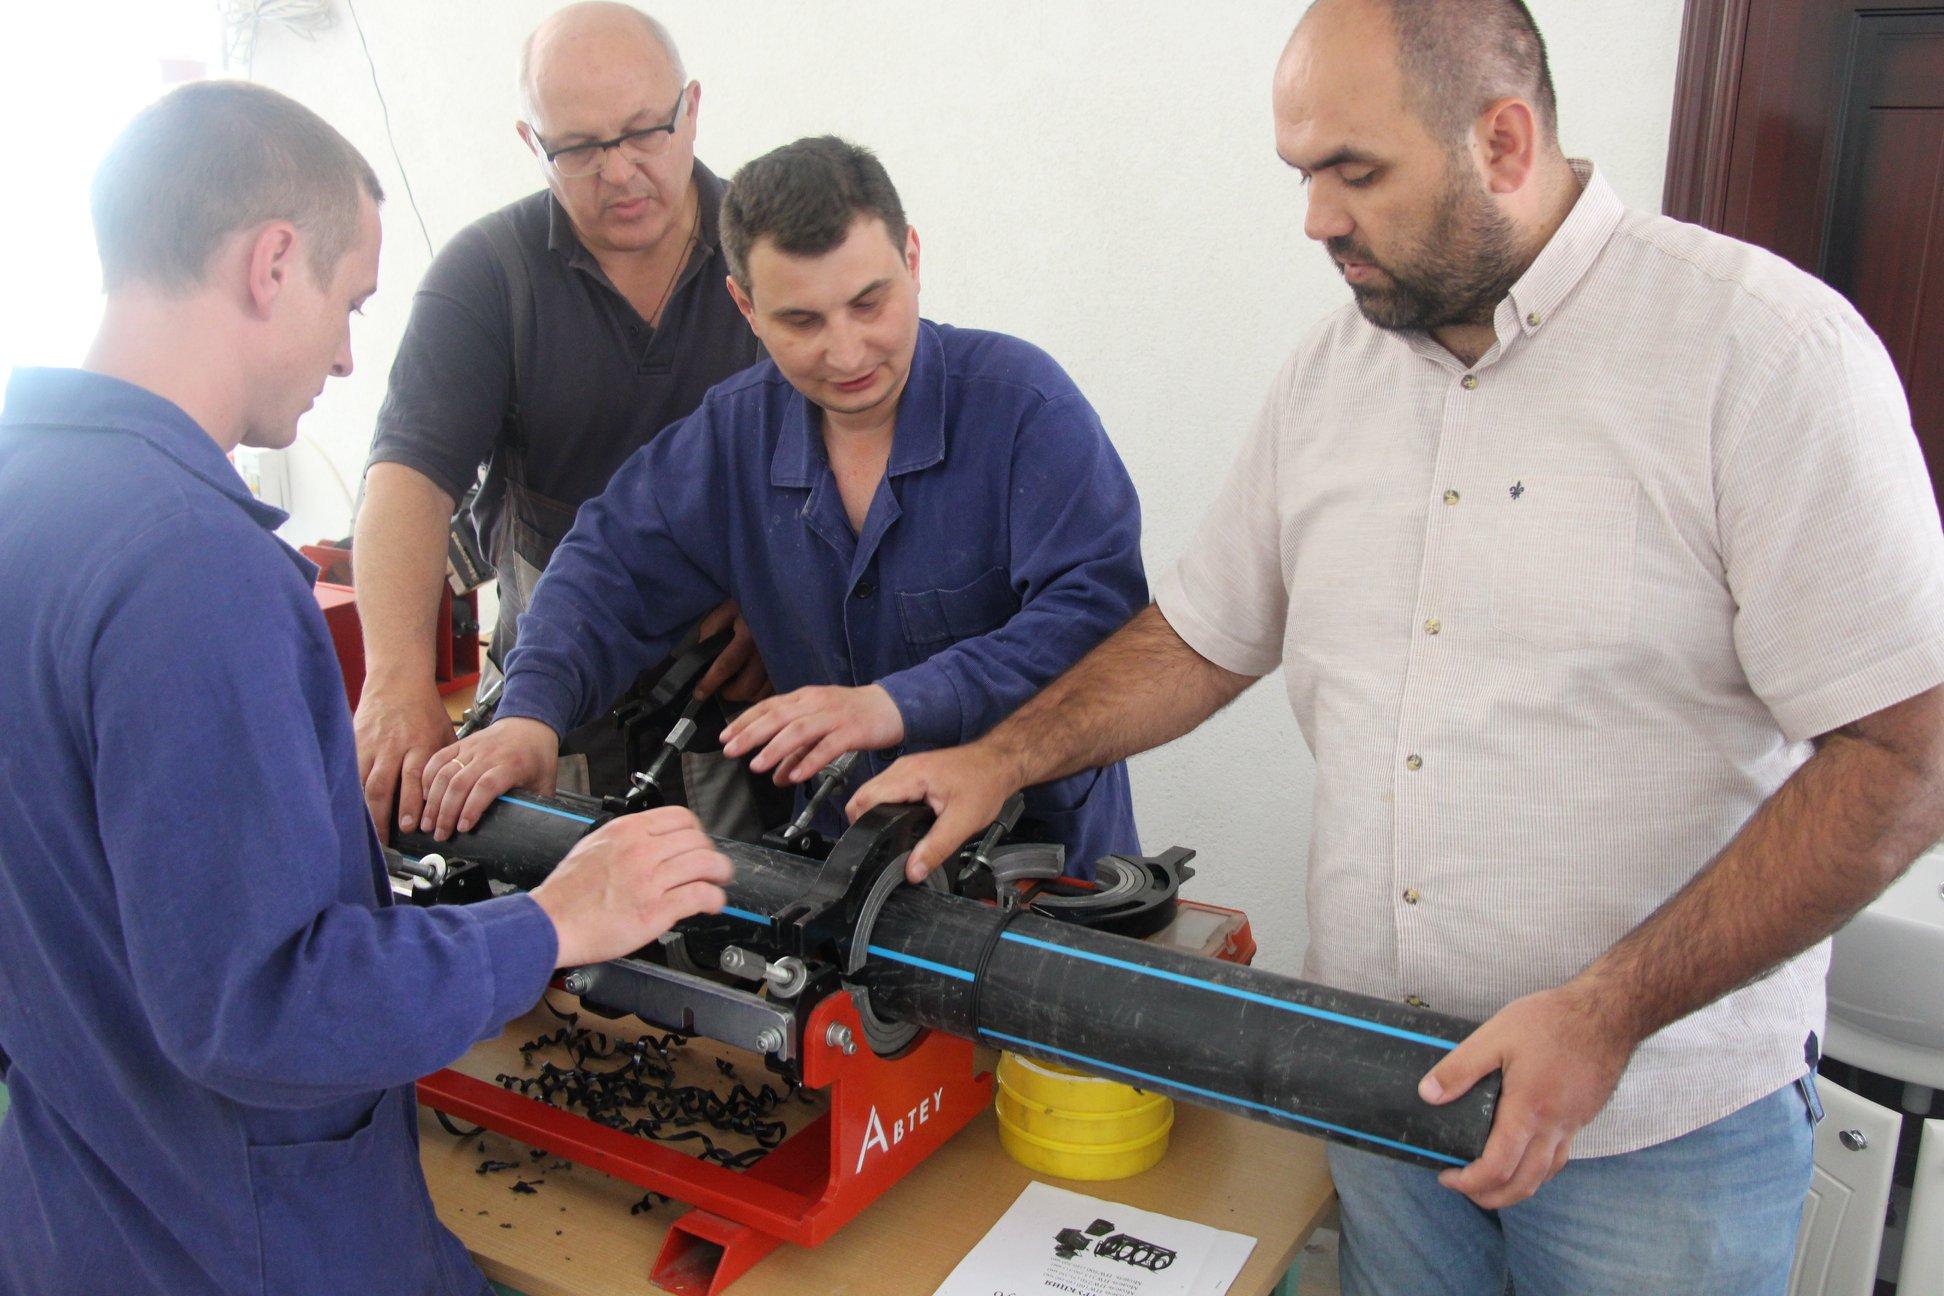 Occupational training Welders